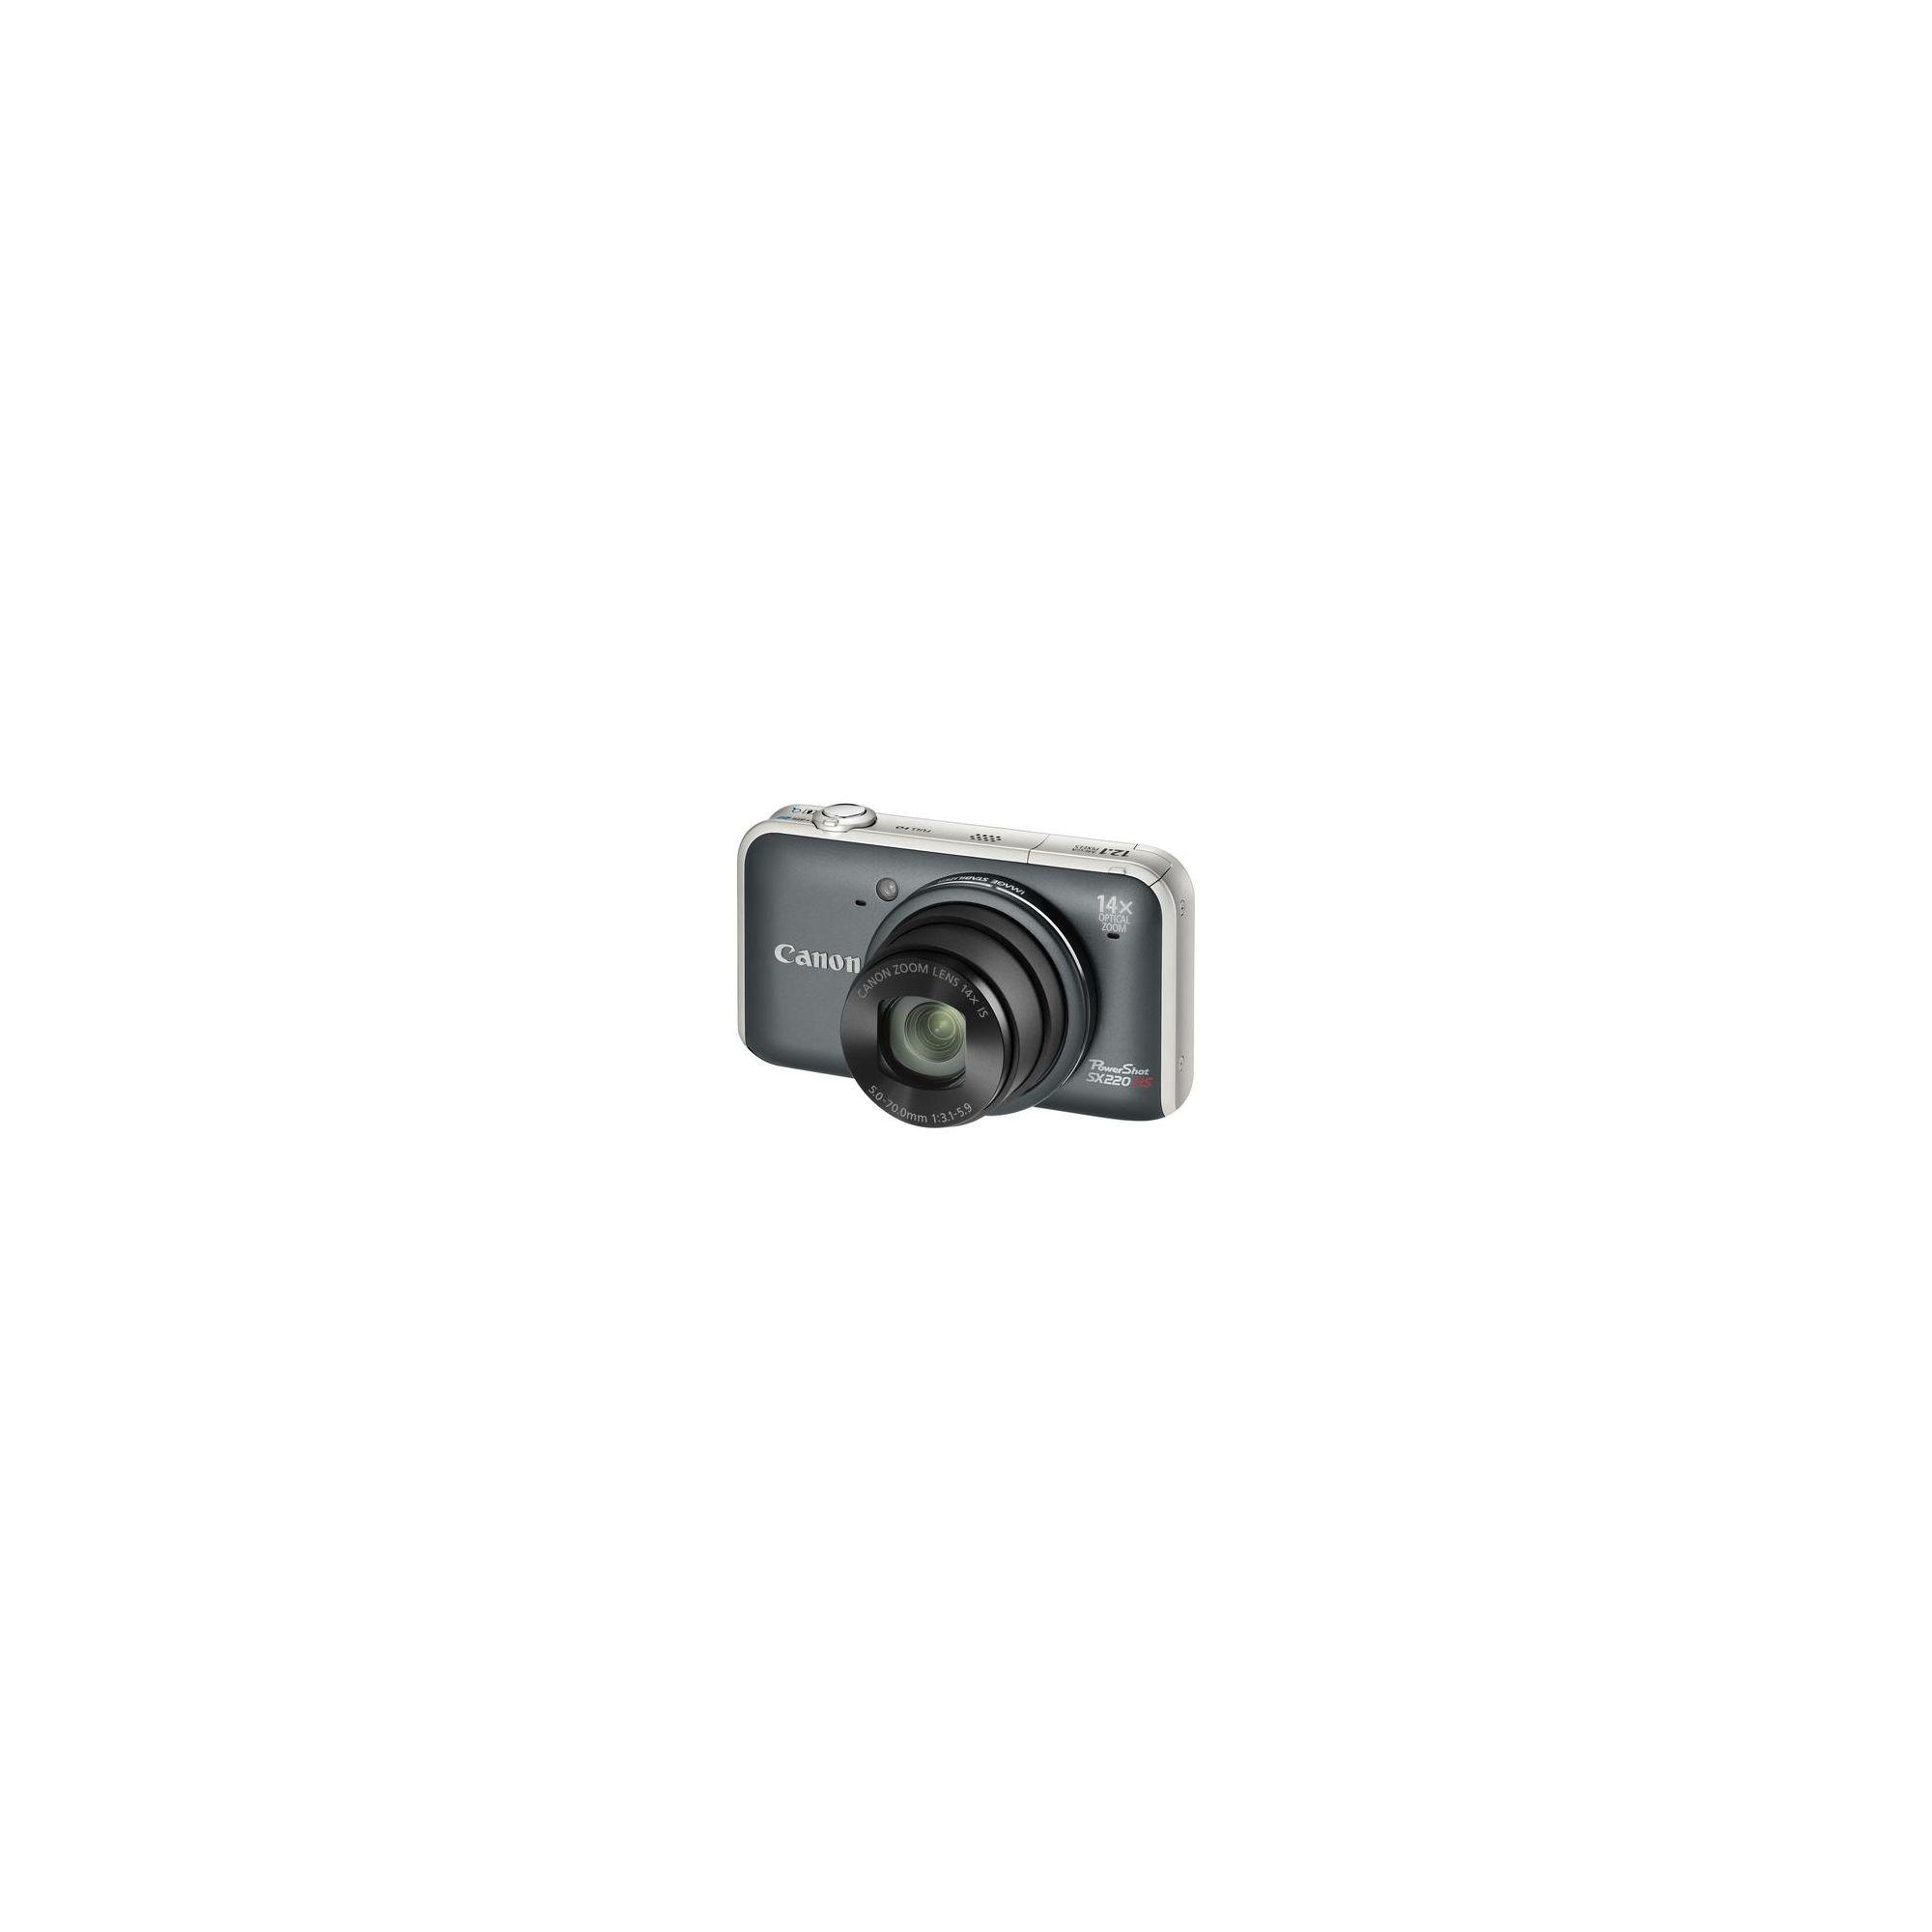 Canon PowerShot SX220 HS Digital Camera - Grey